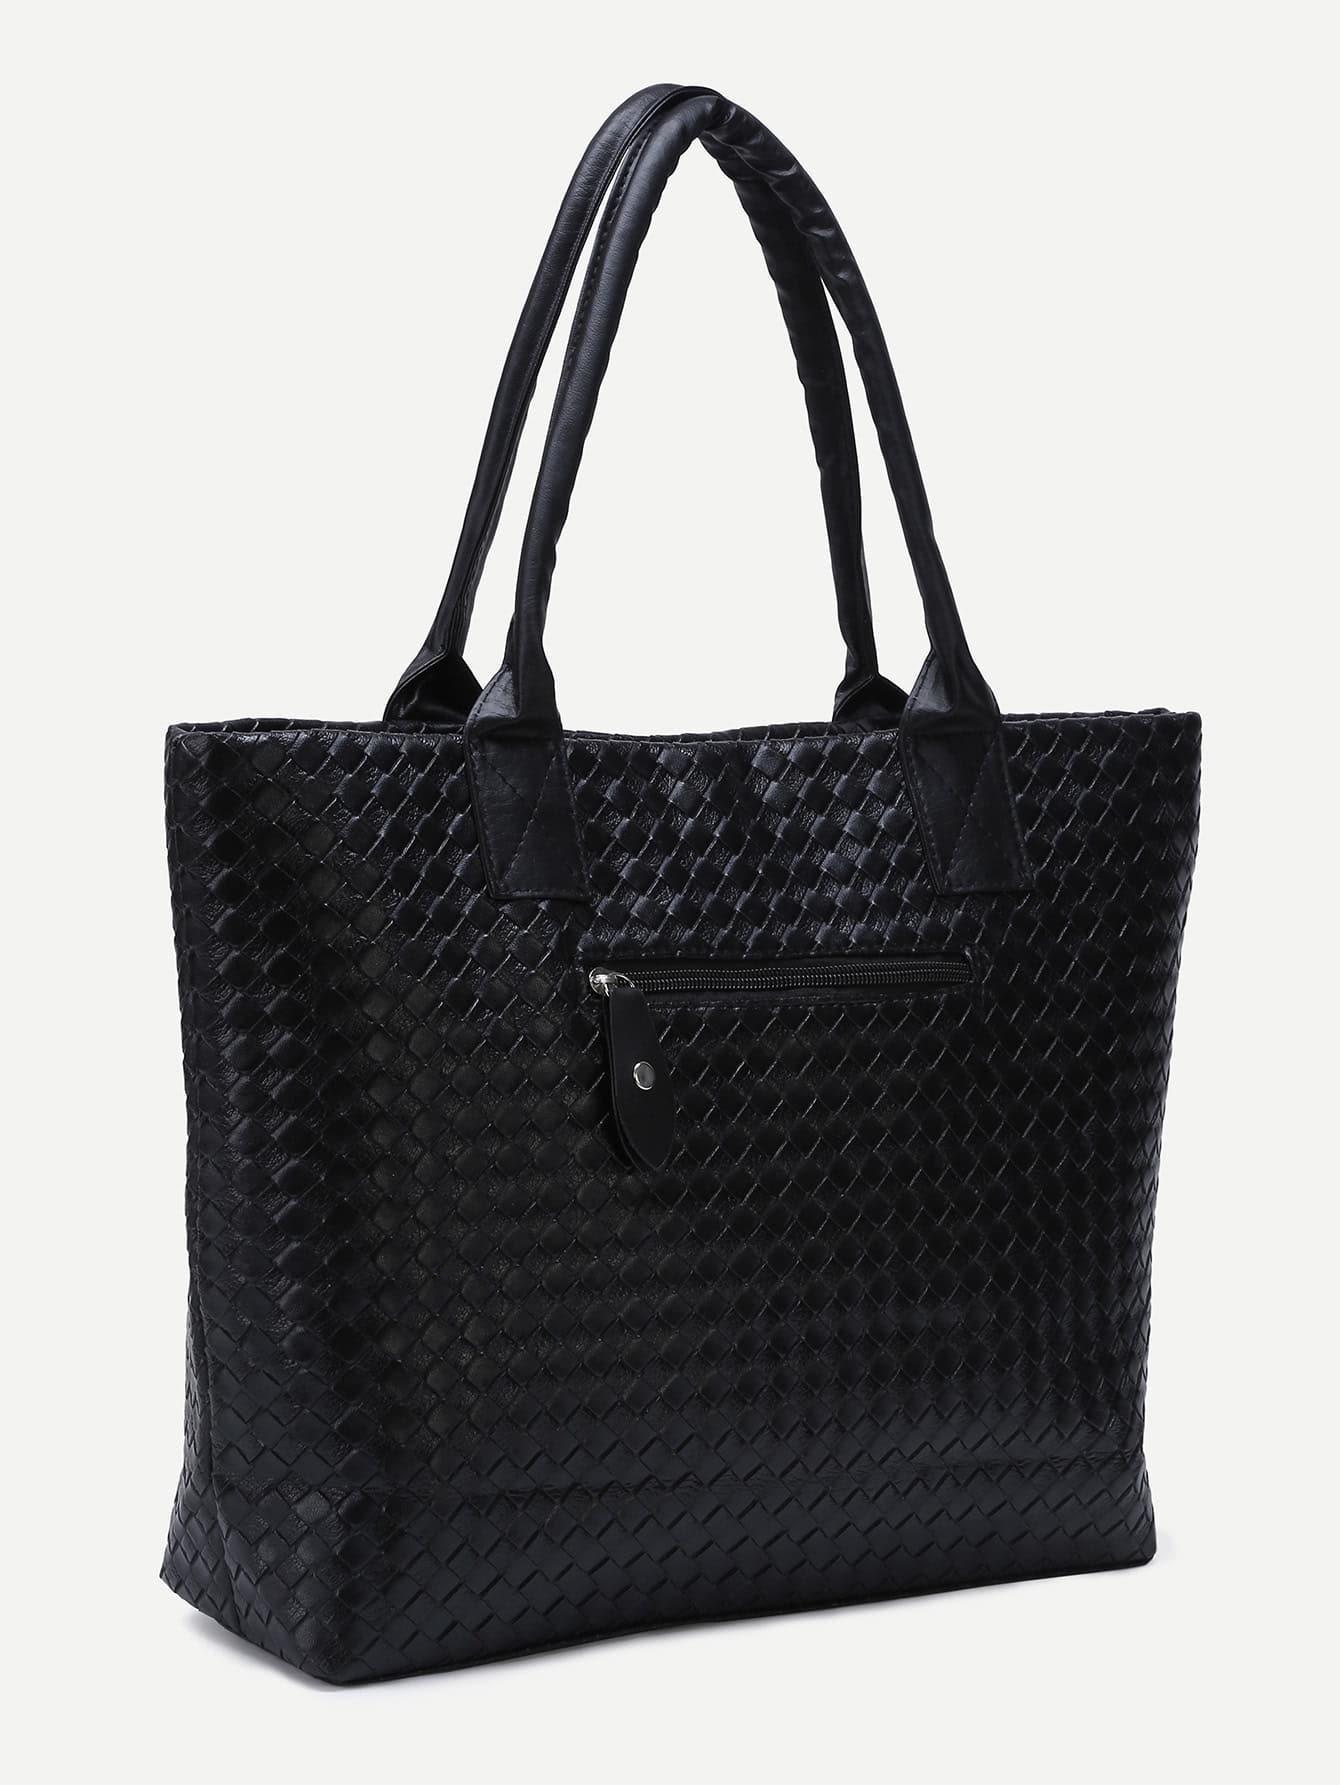 bag160909306_2